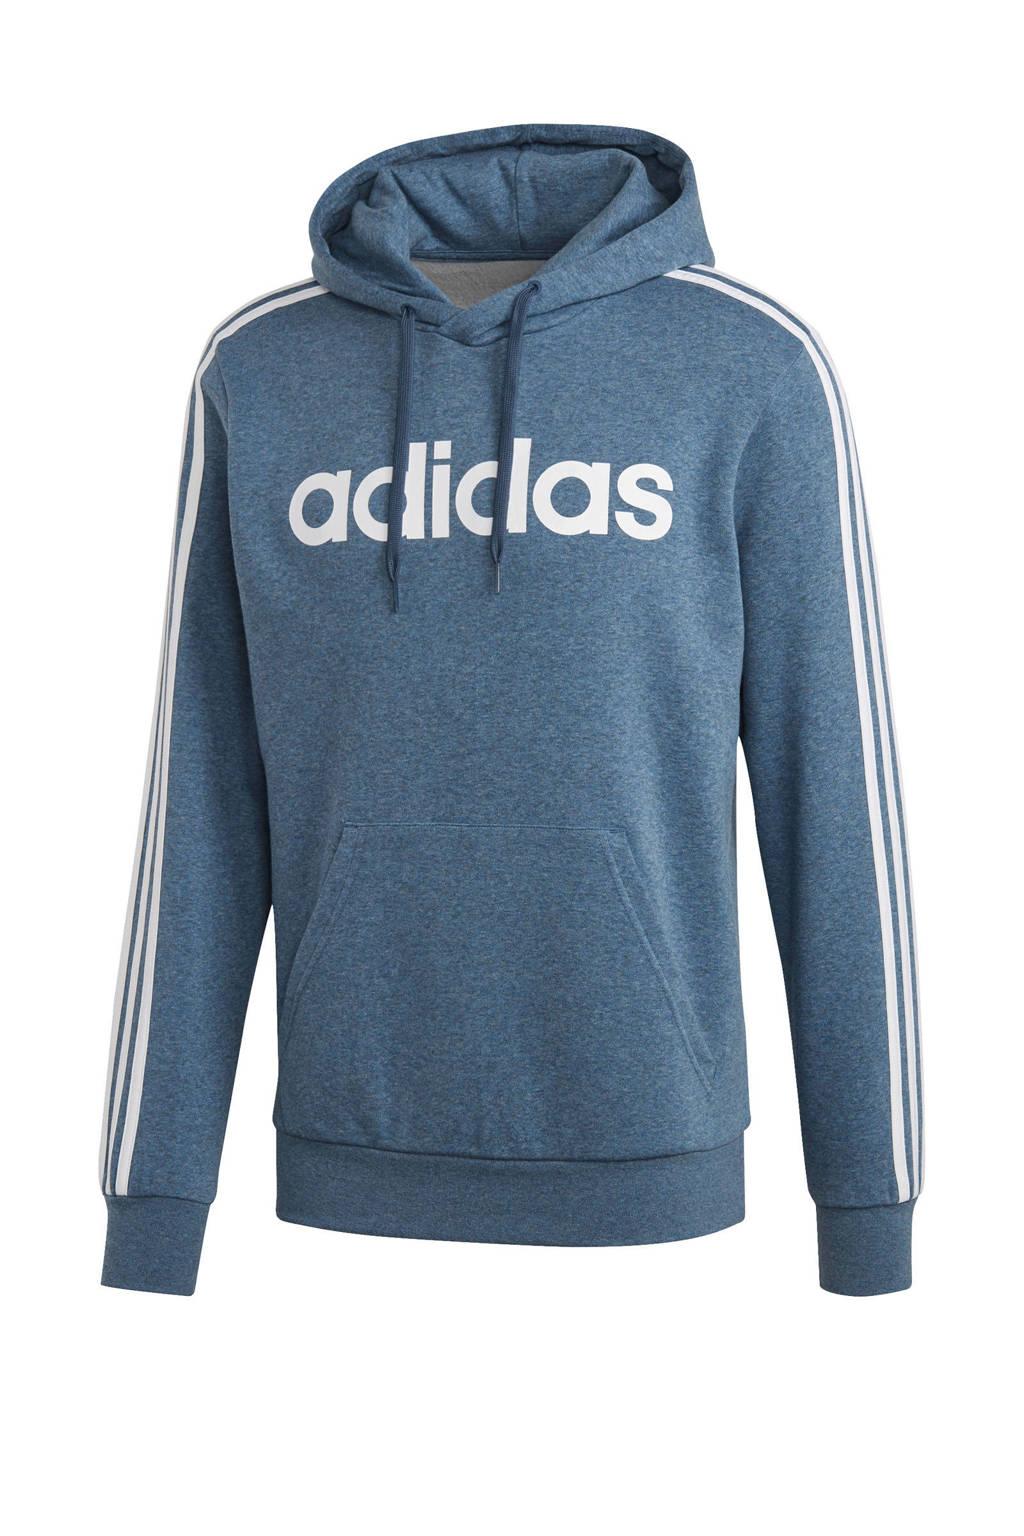 adidas   sportsweater grijsblauw, Grijsblauw/wit